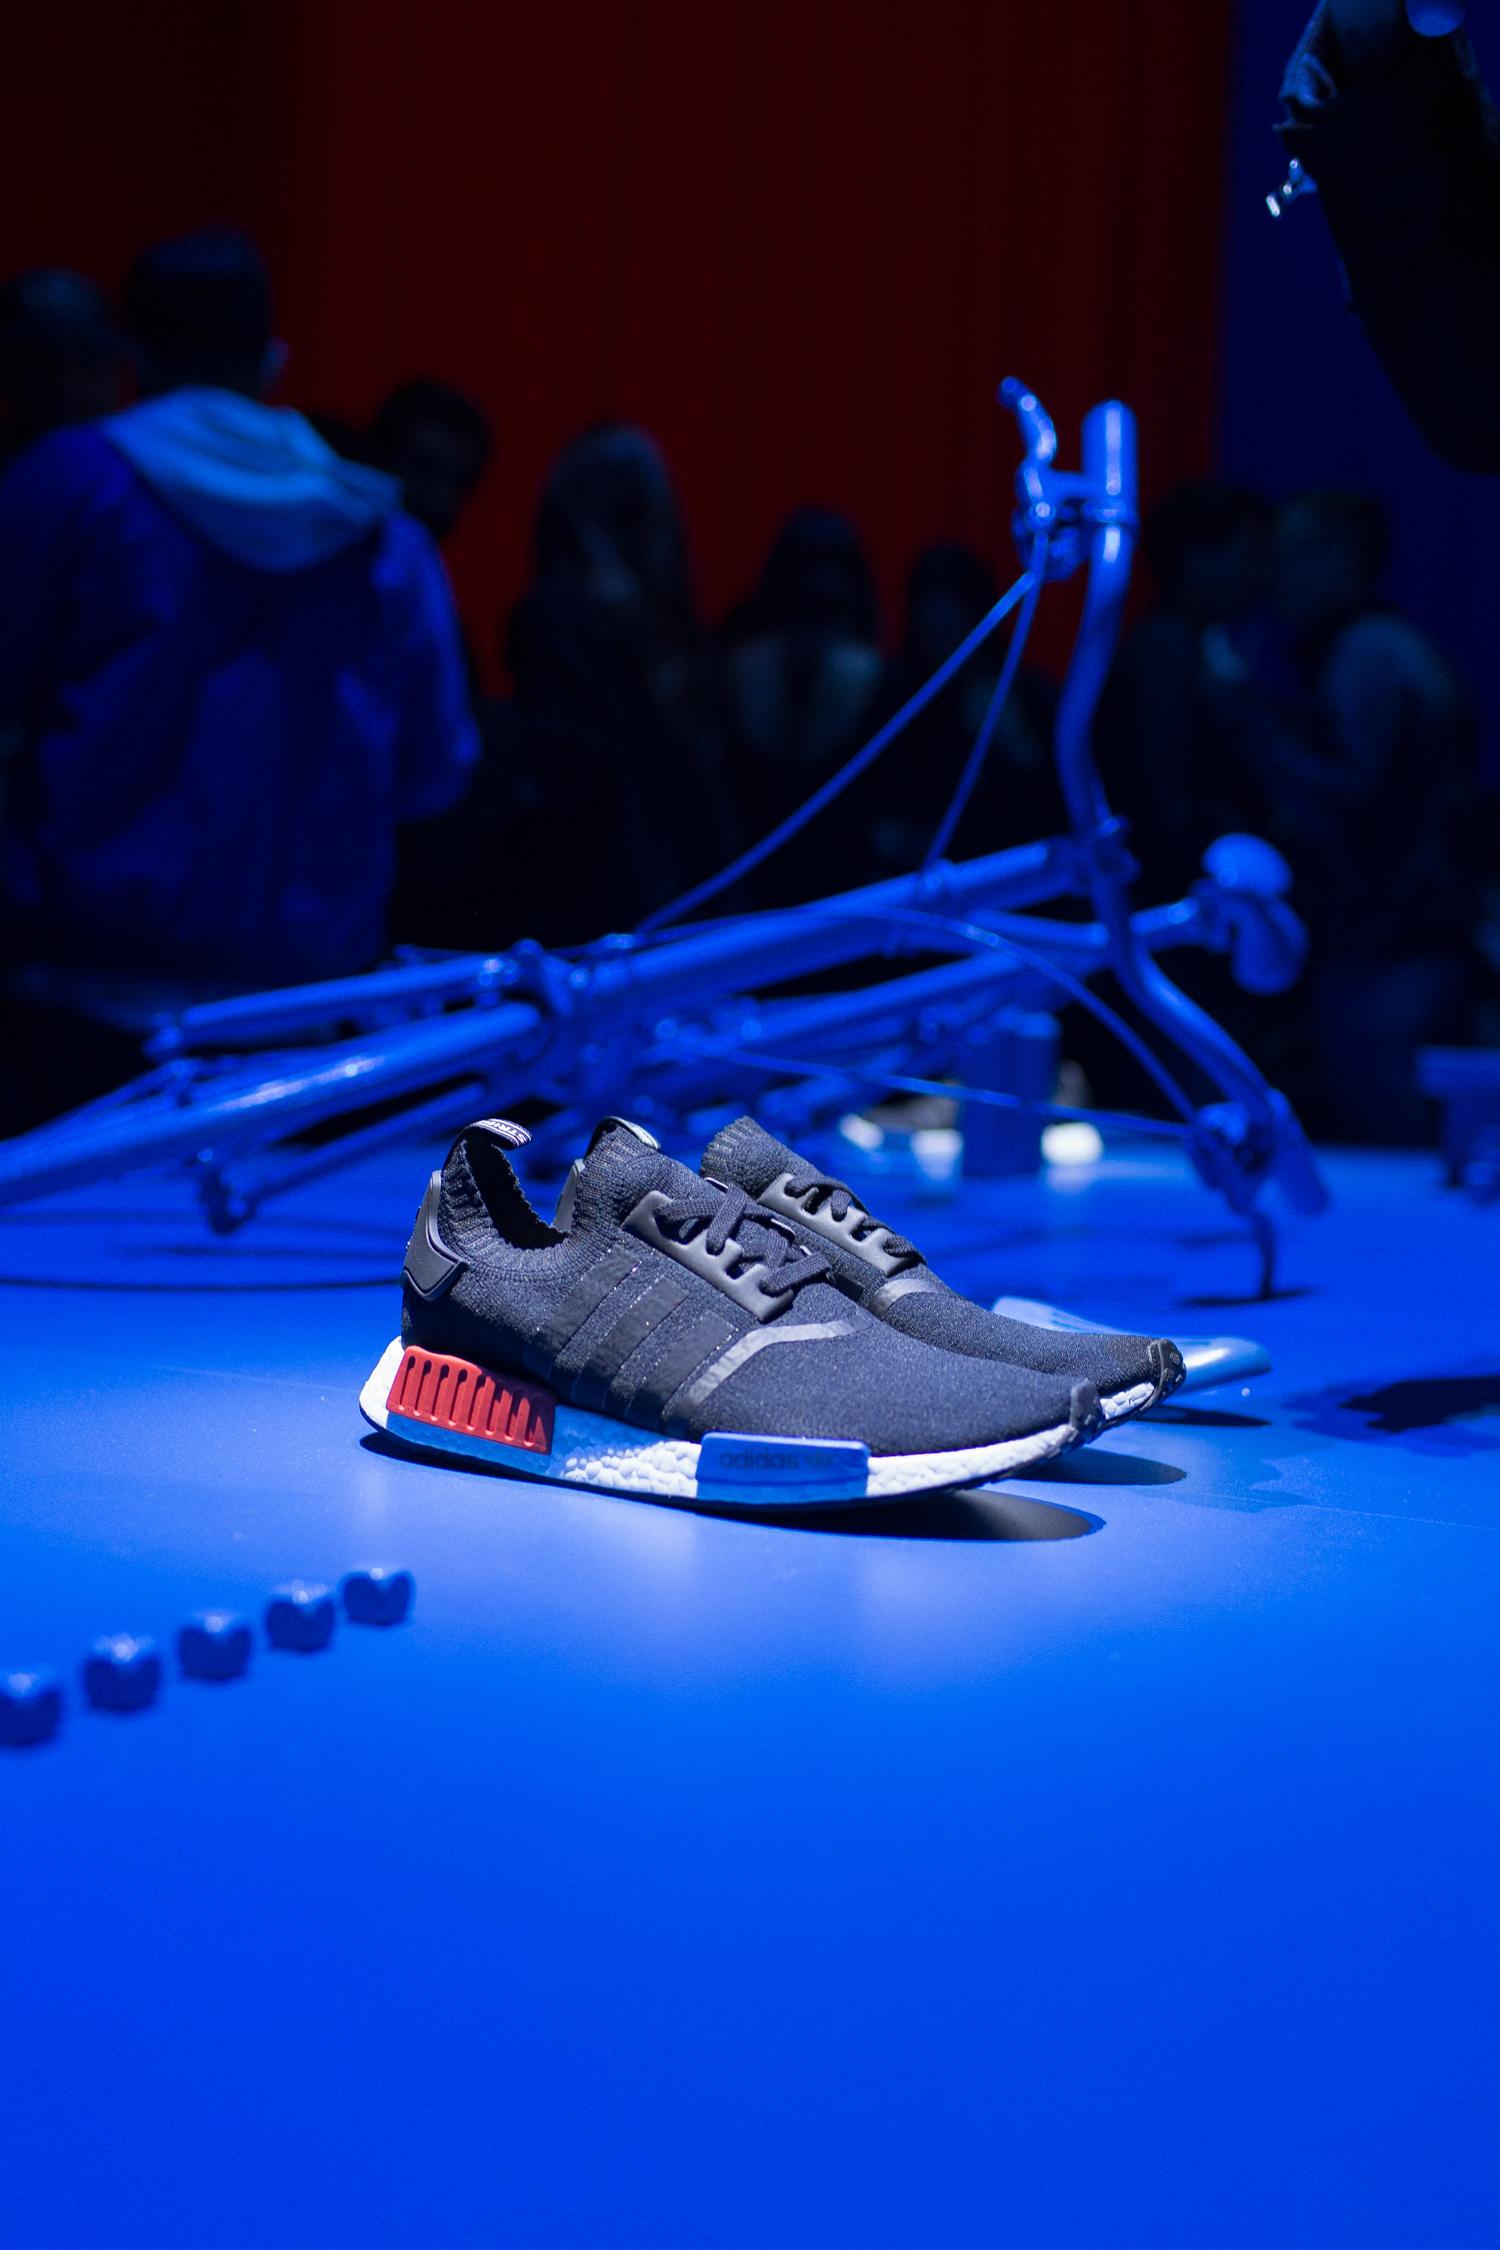 adidas-Originals-NMD-launch-New-York-THE-DAILY-STREET-20